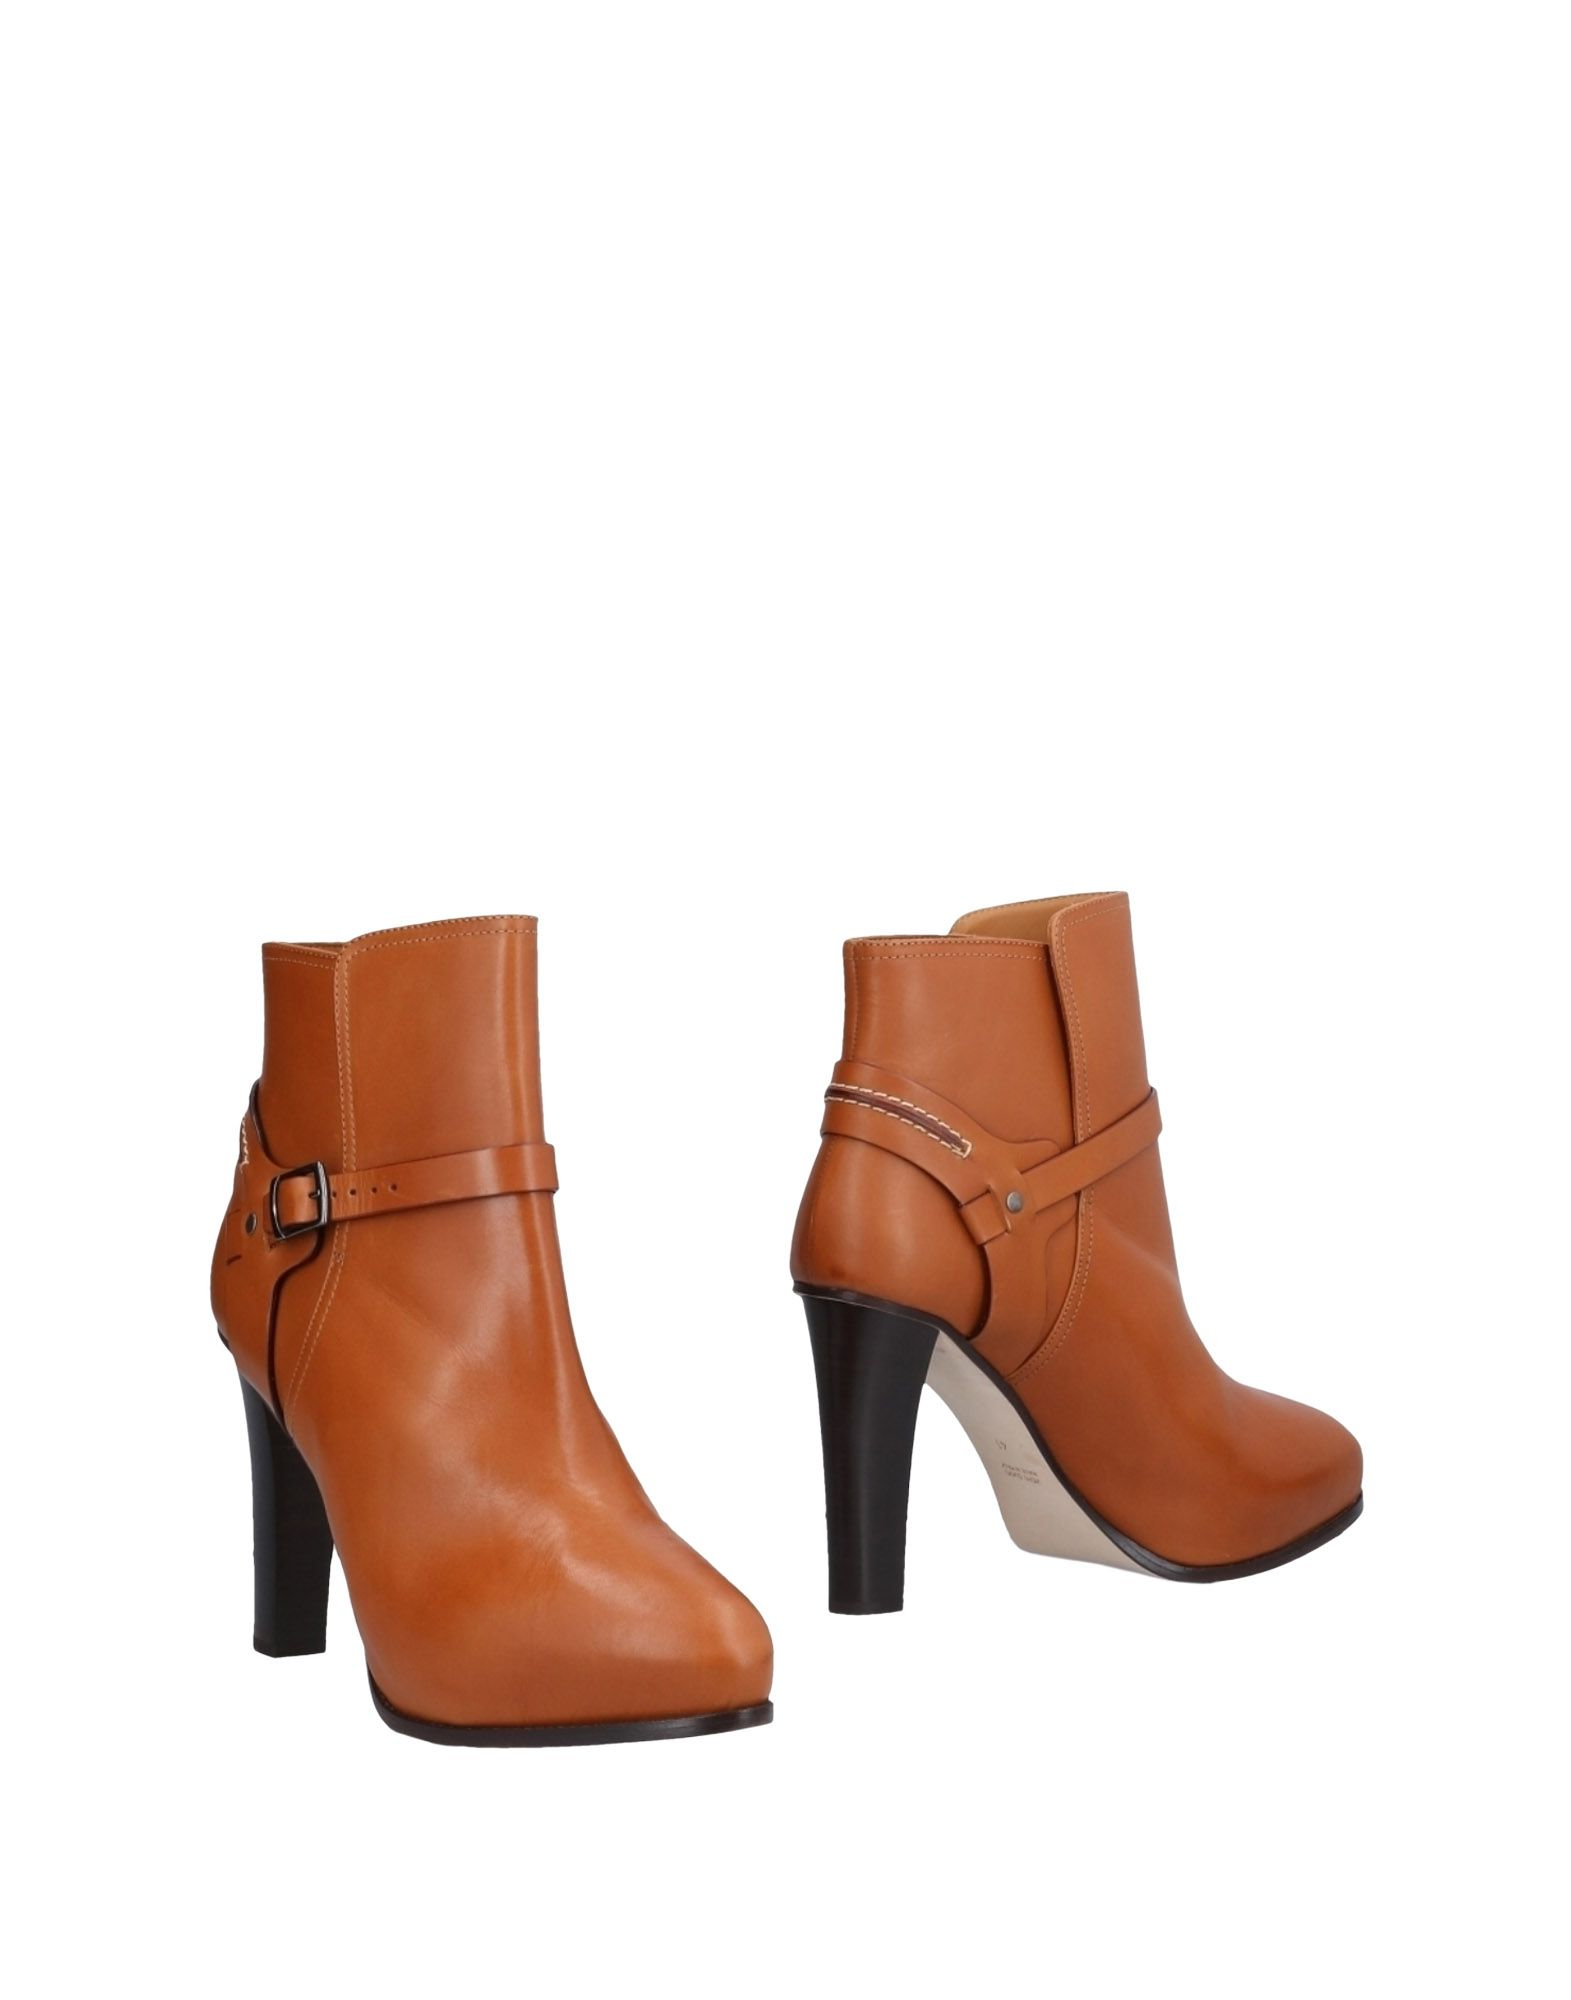 Cavallini Stiefelette Damen Damen Stiefelette  11484004KB Heiße Schuhe 23bee0